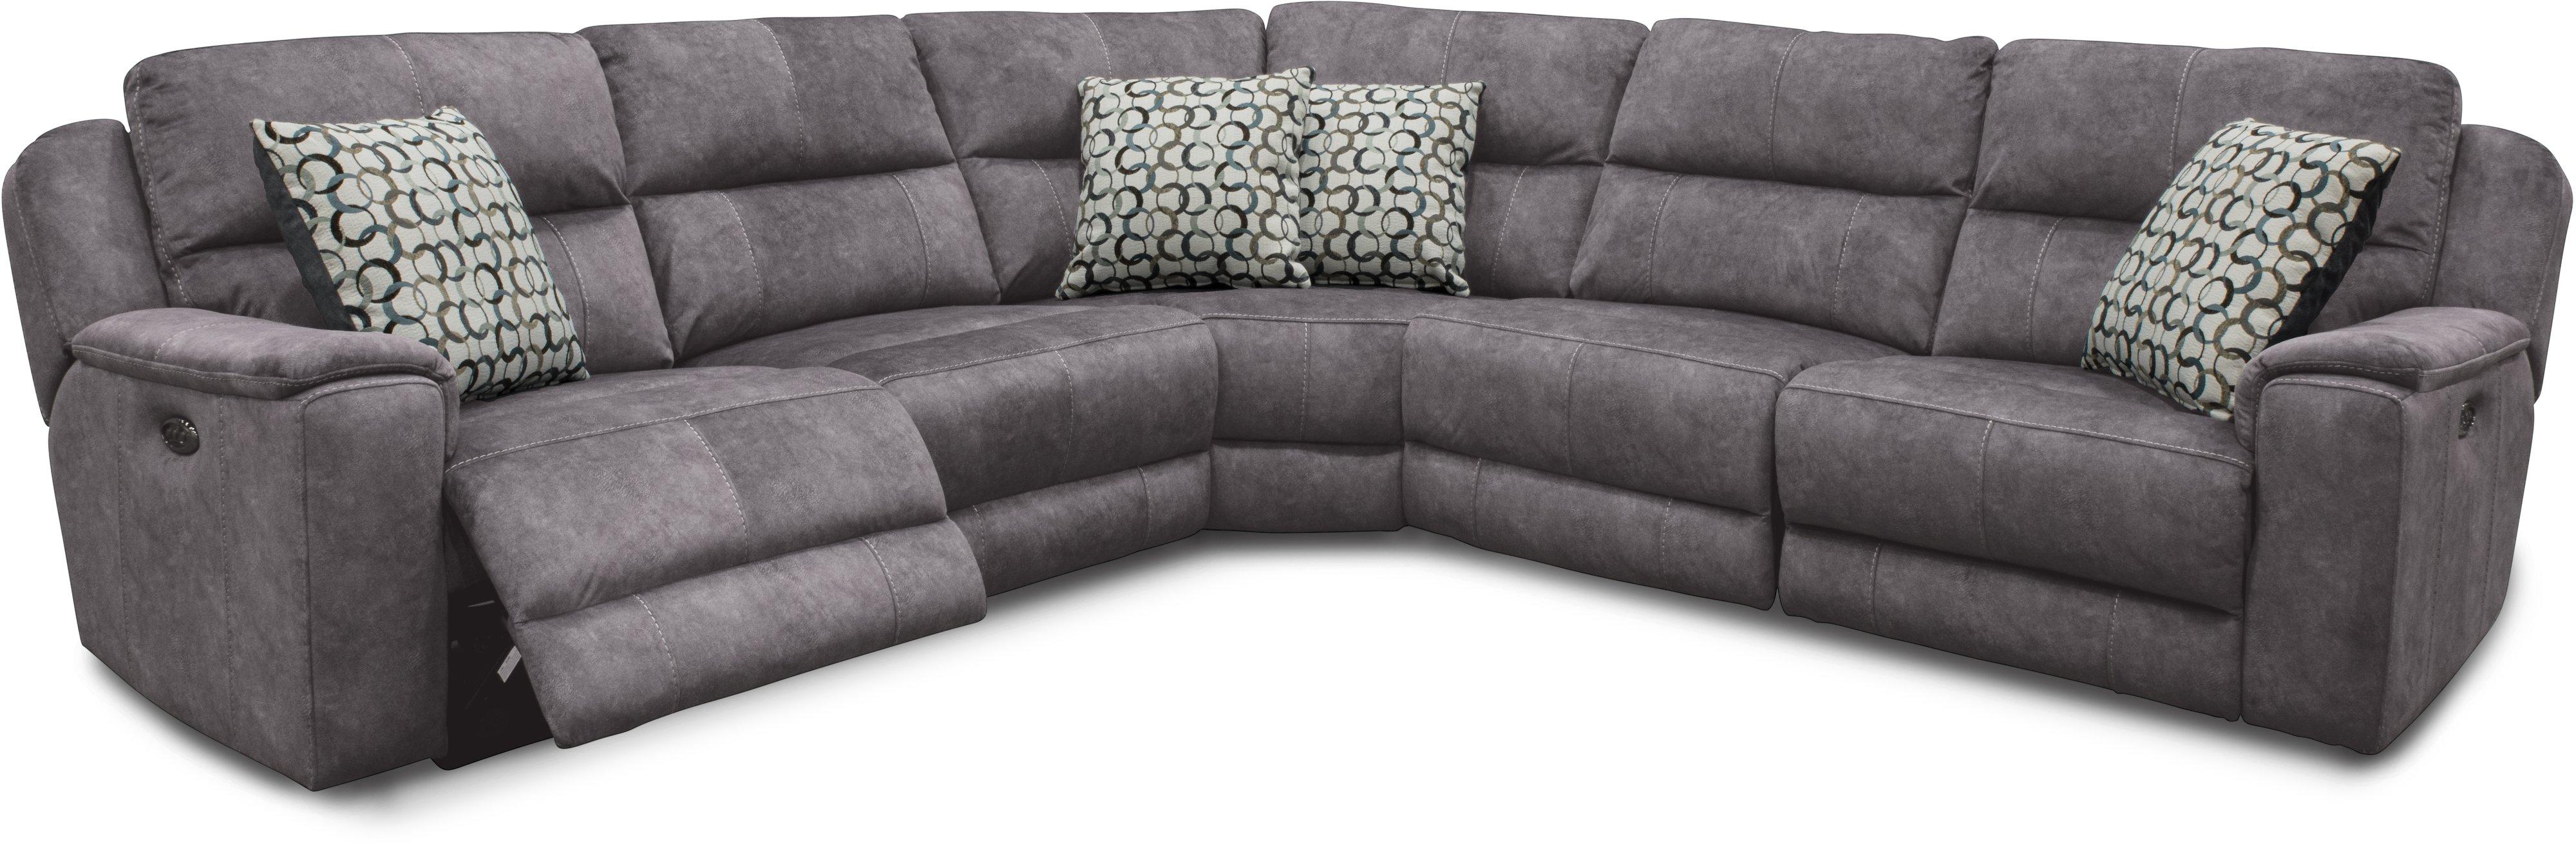 Blue 5 Piece Power Reclining Sectional Sofa   Imprint